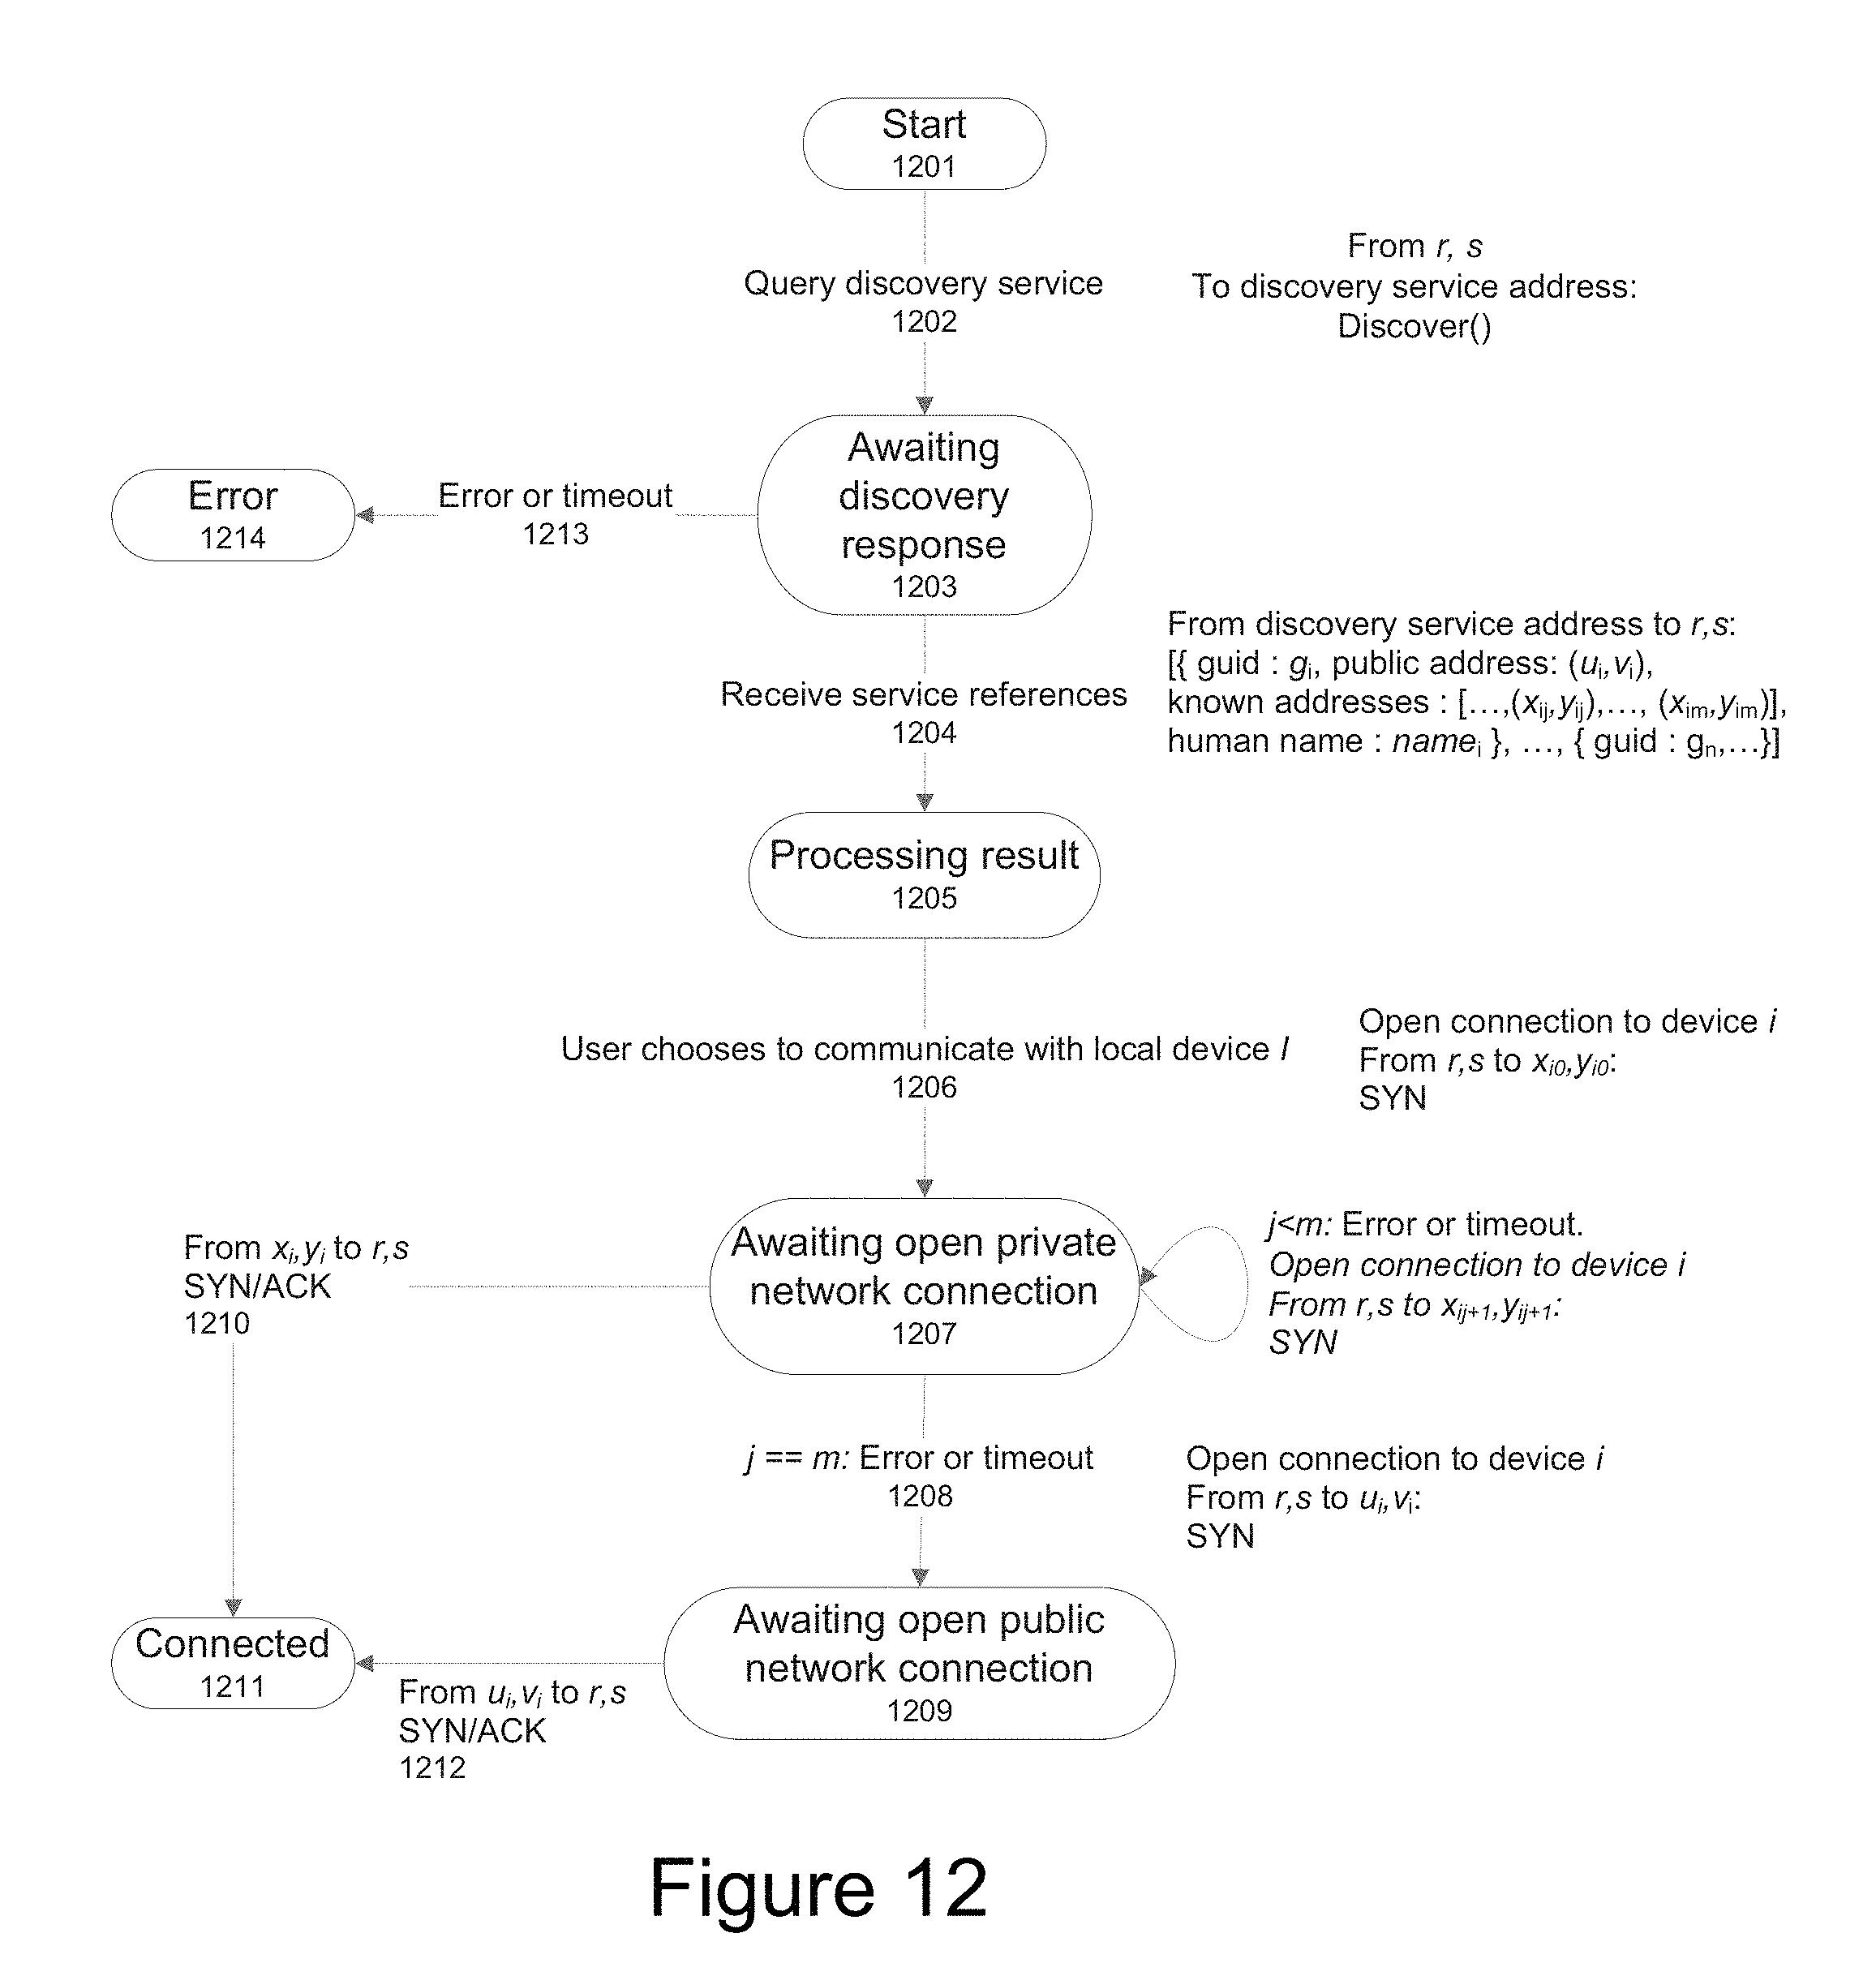 Patent US 9,706,265 B2